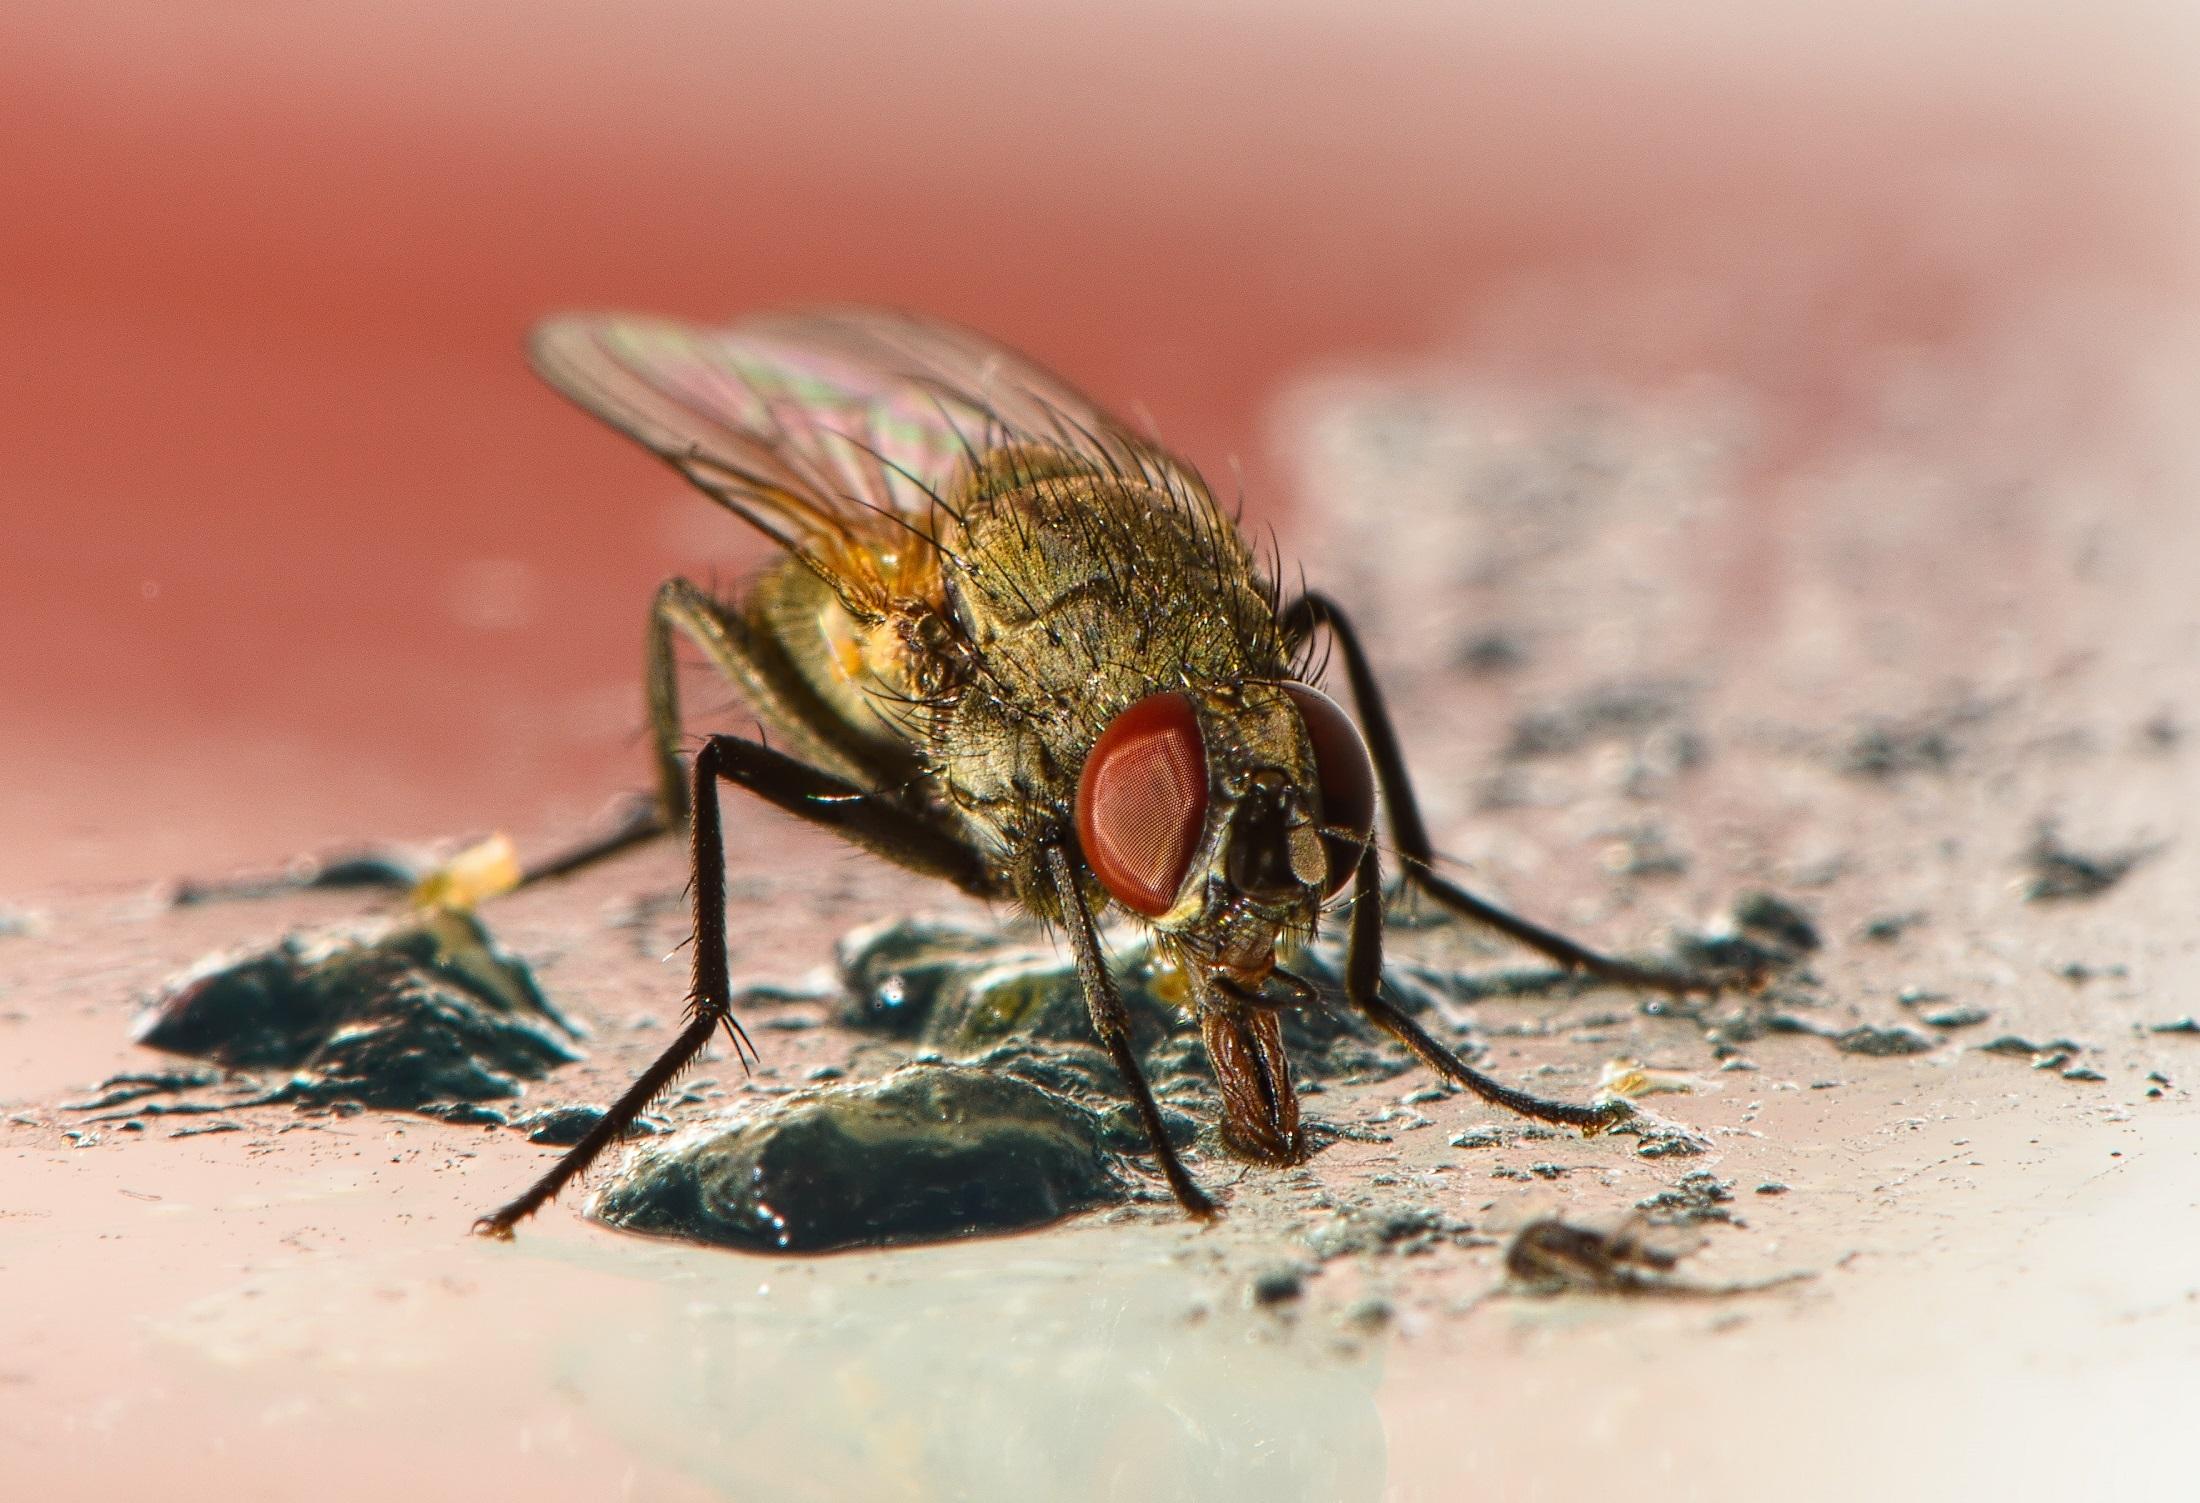 Fly closeup photo